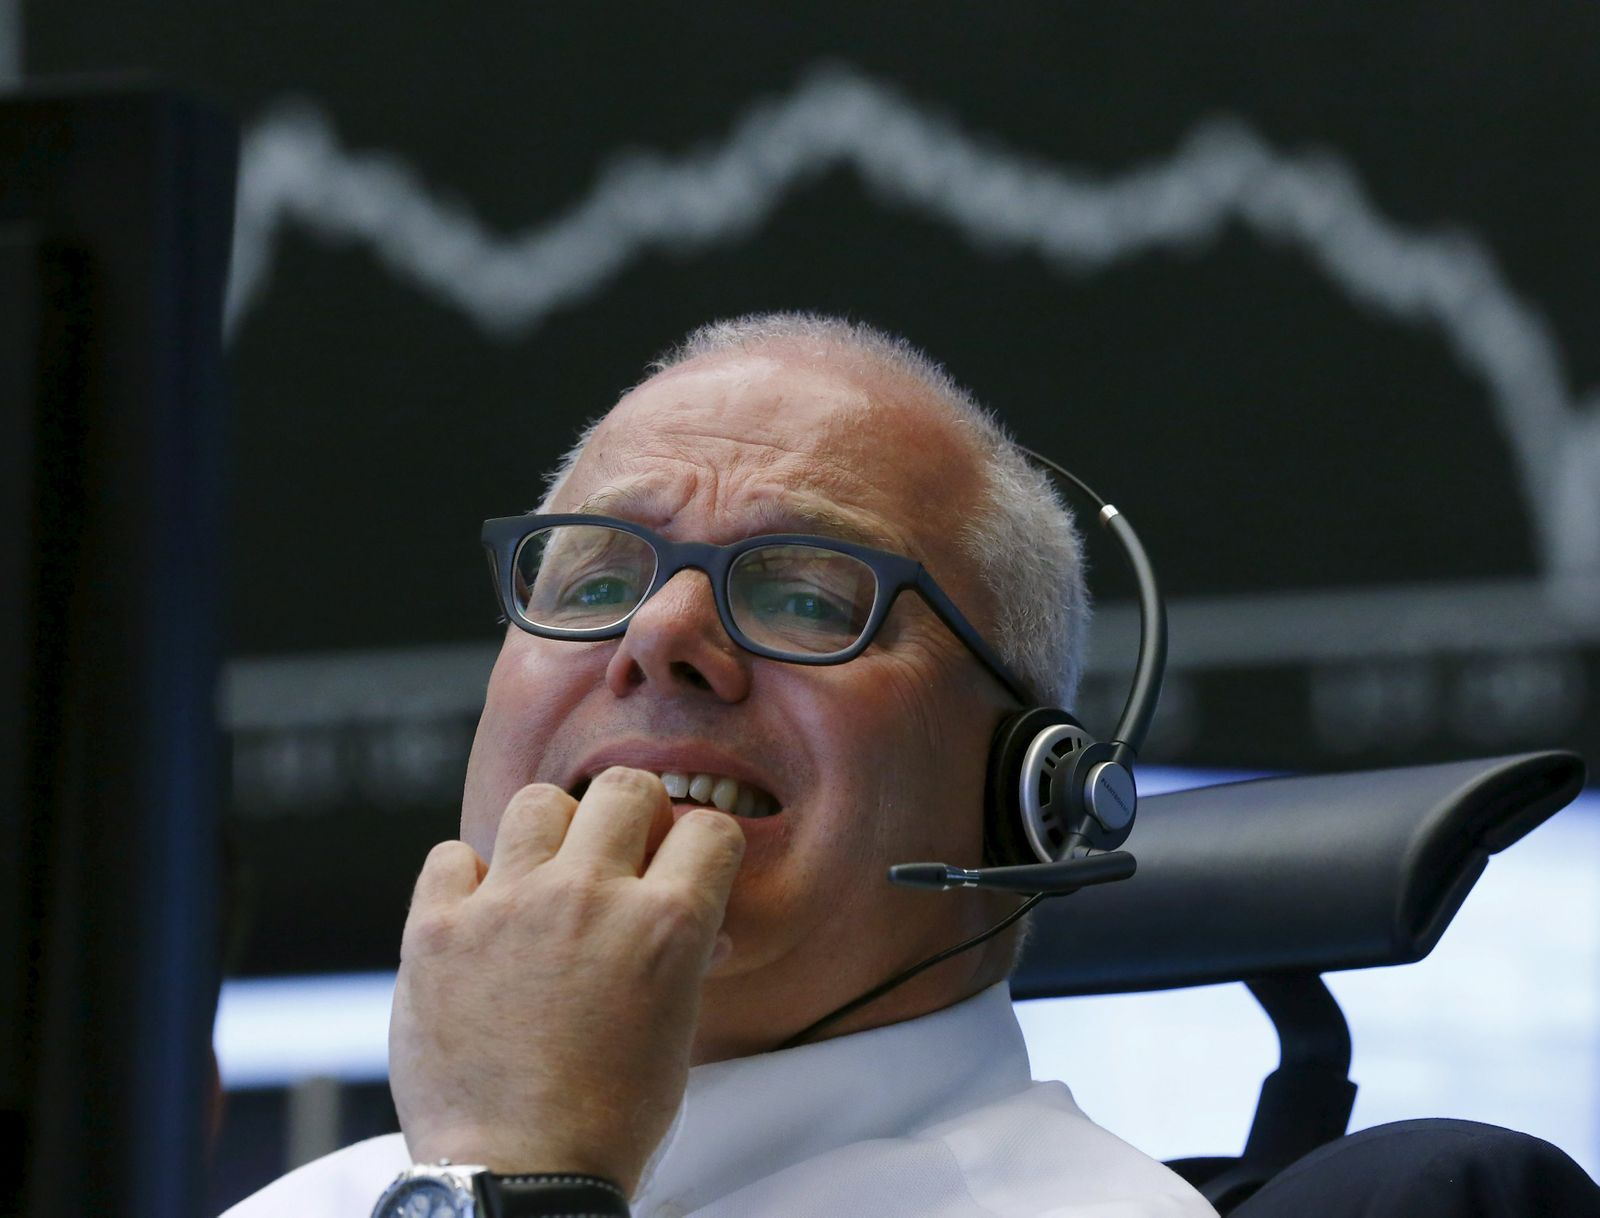 Börse Frankfurt Weltweit